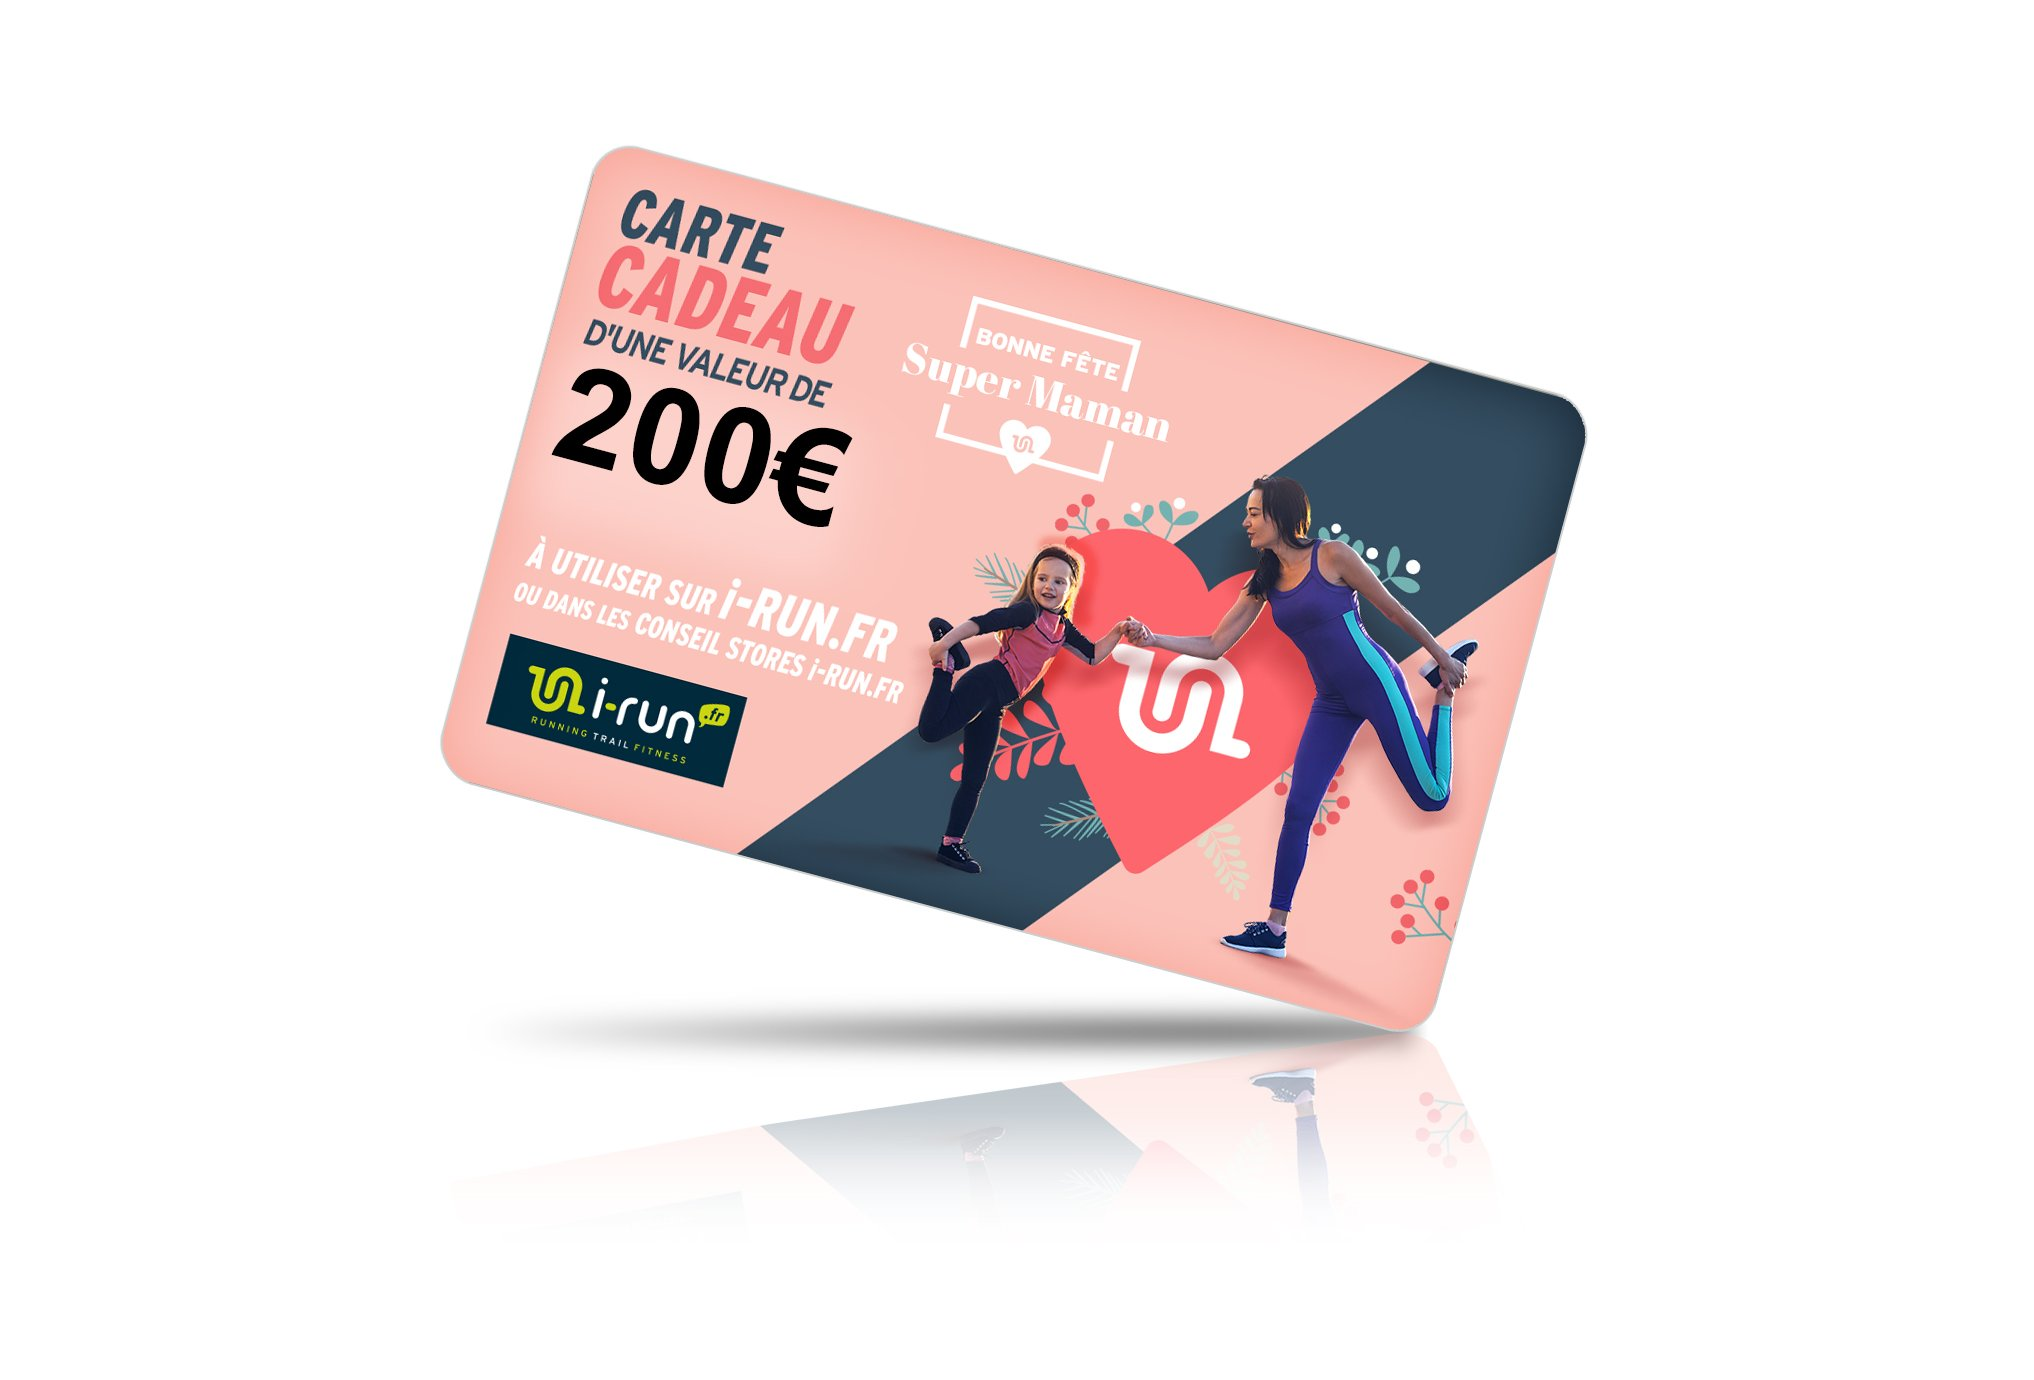 i-run.fr Carte Cadeau 200 Fête des Mères Cartes Cadeau